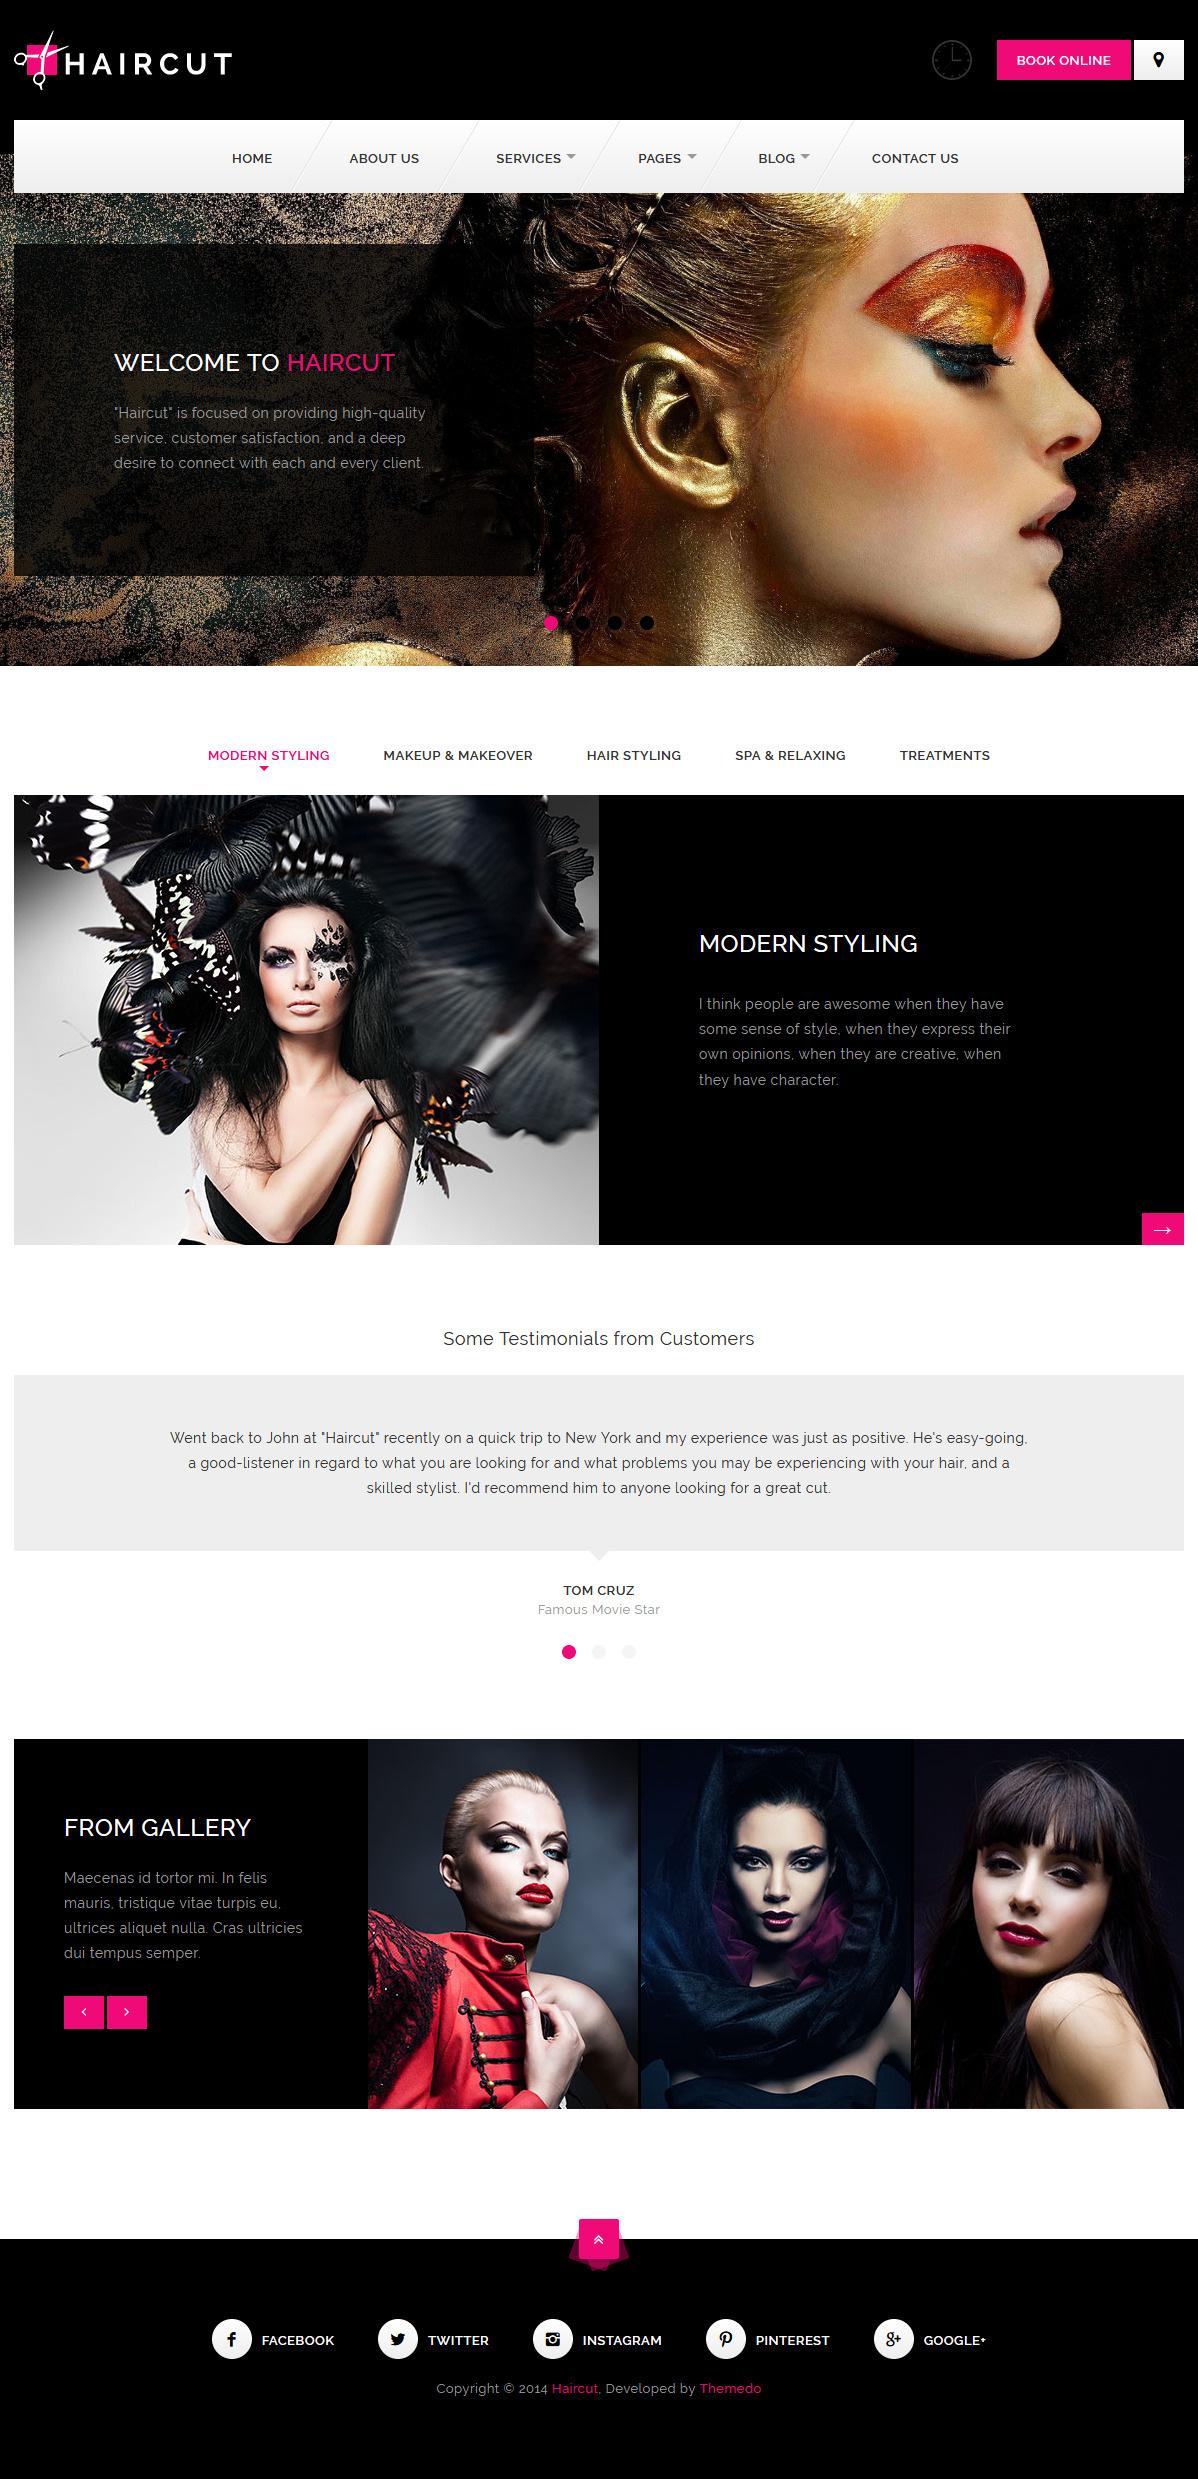 haircut best premium spa beauty wordpress theme - 10+ Best Premium Spa and Beauty WordPress Themes